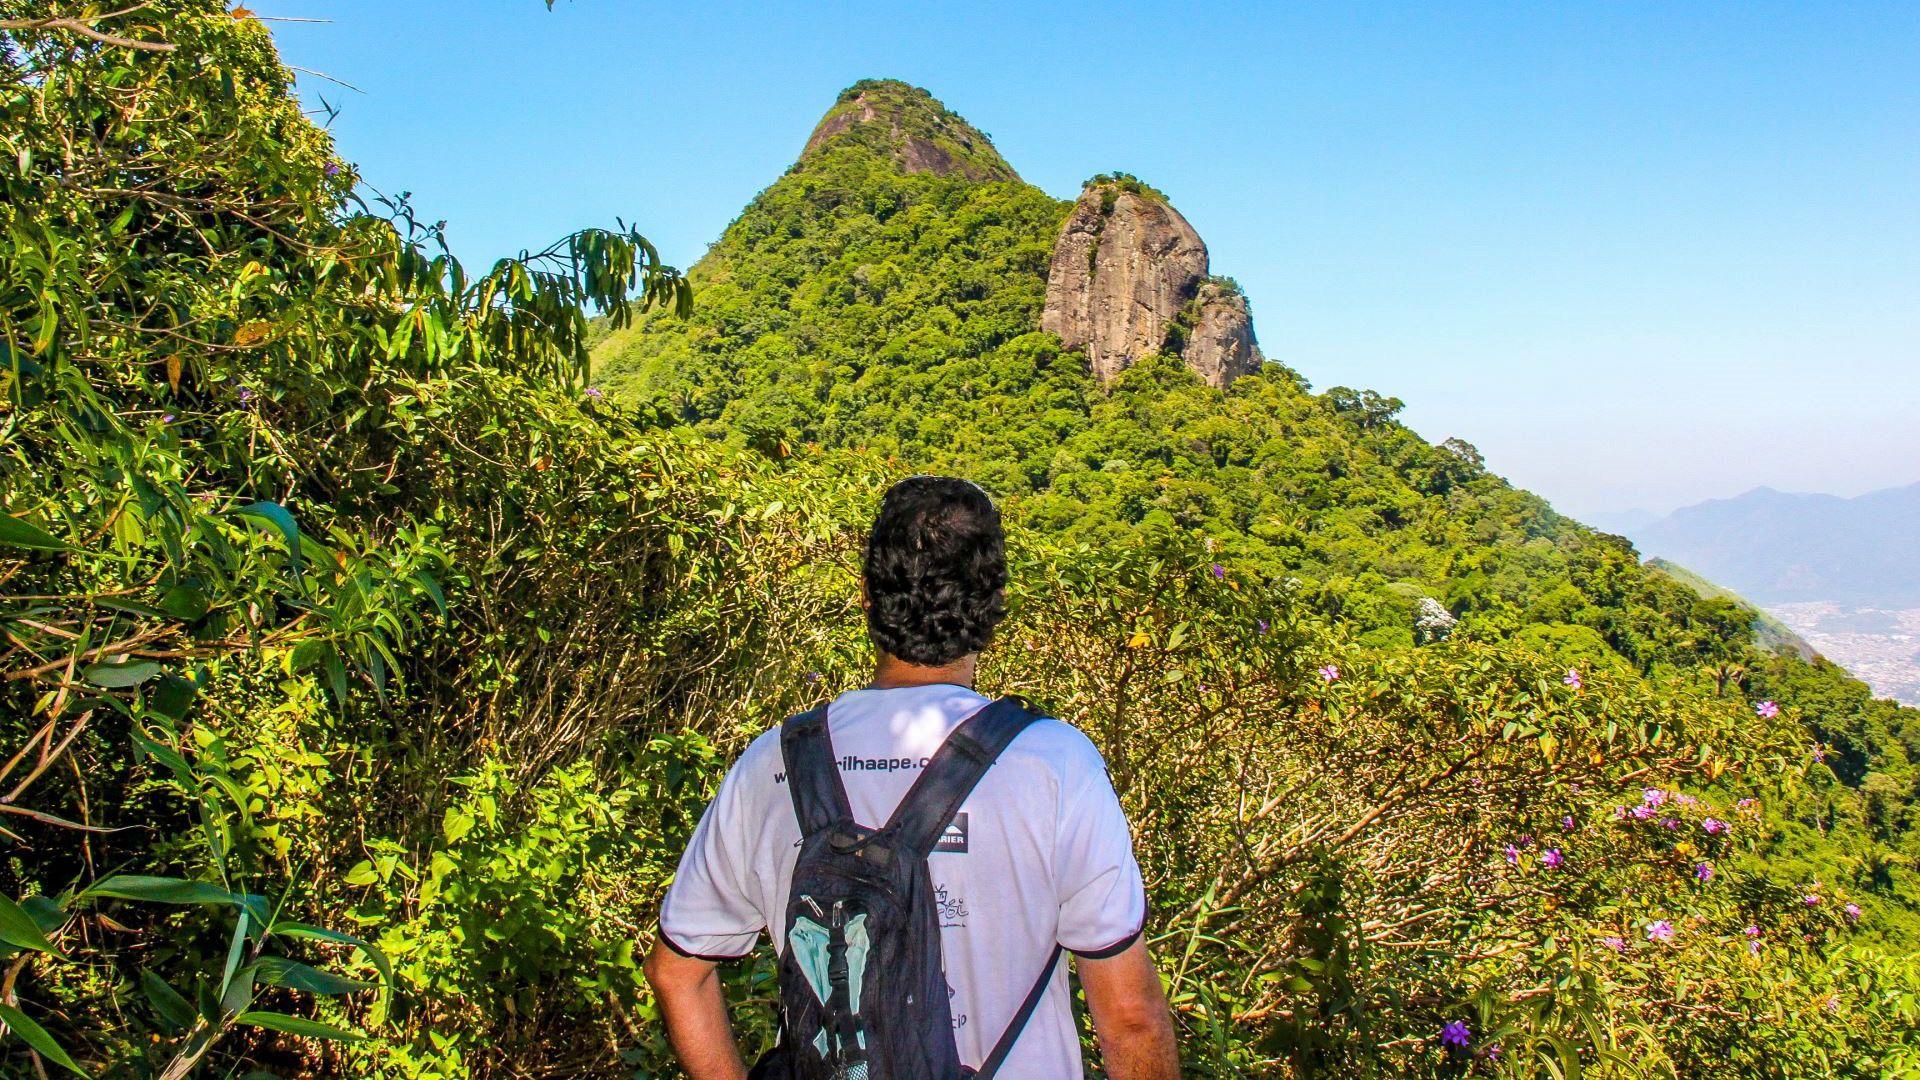 Hiking man at Tijuca National Park in Rio de Janeiro